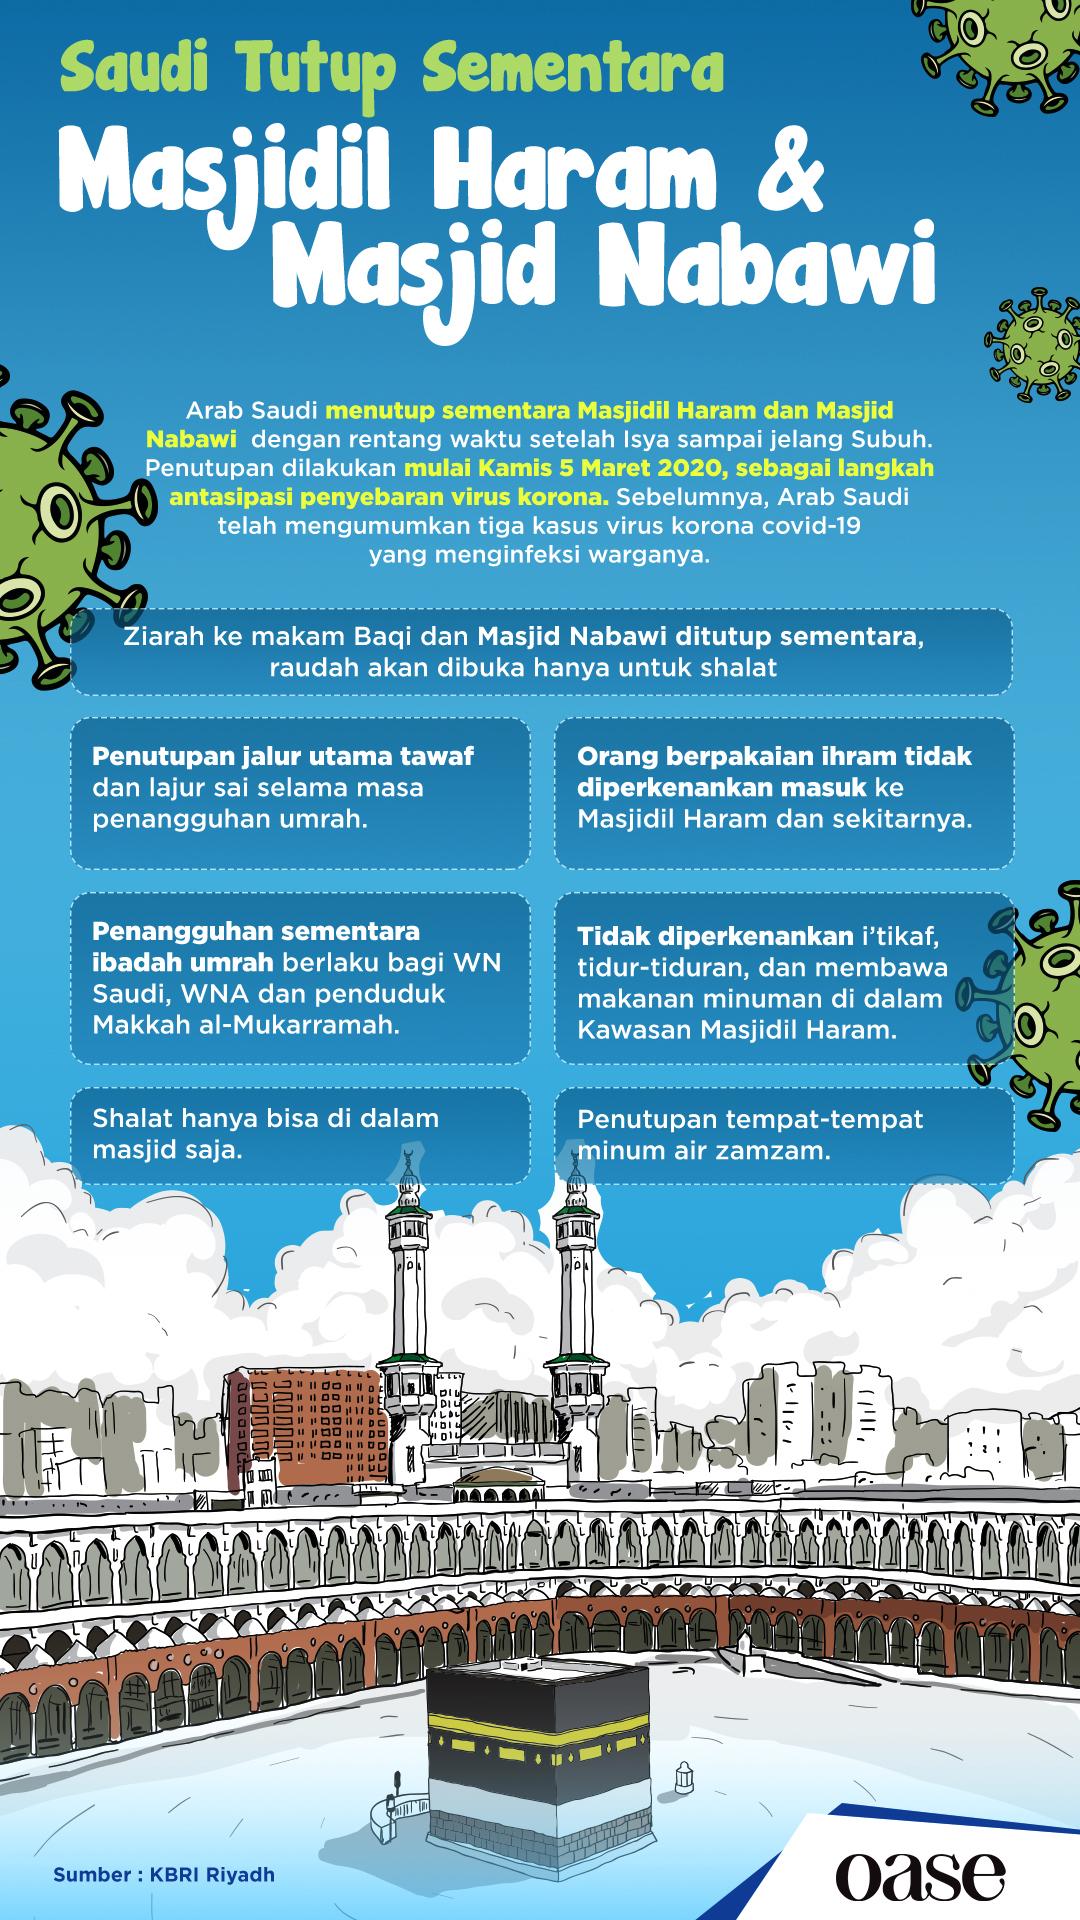 Masjidil Haram dan Nabawi Tutup Sementara